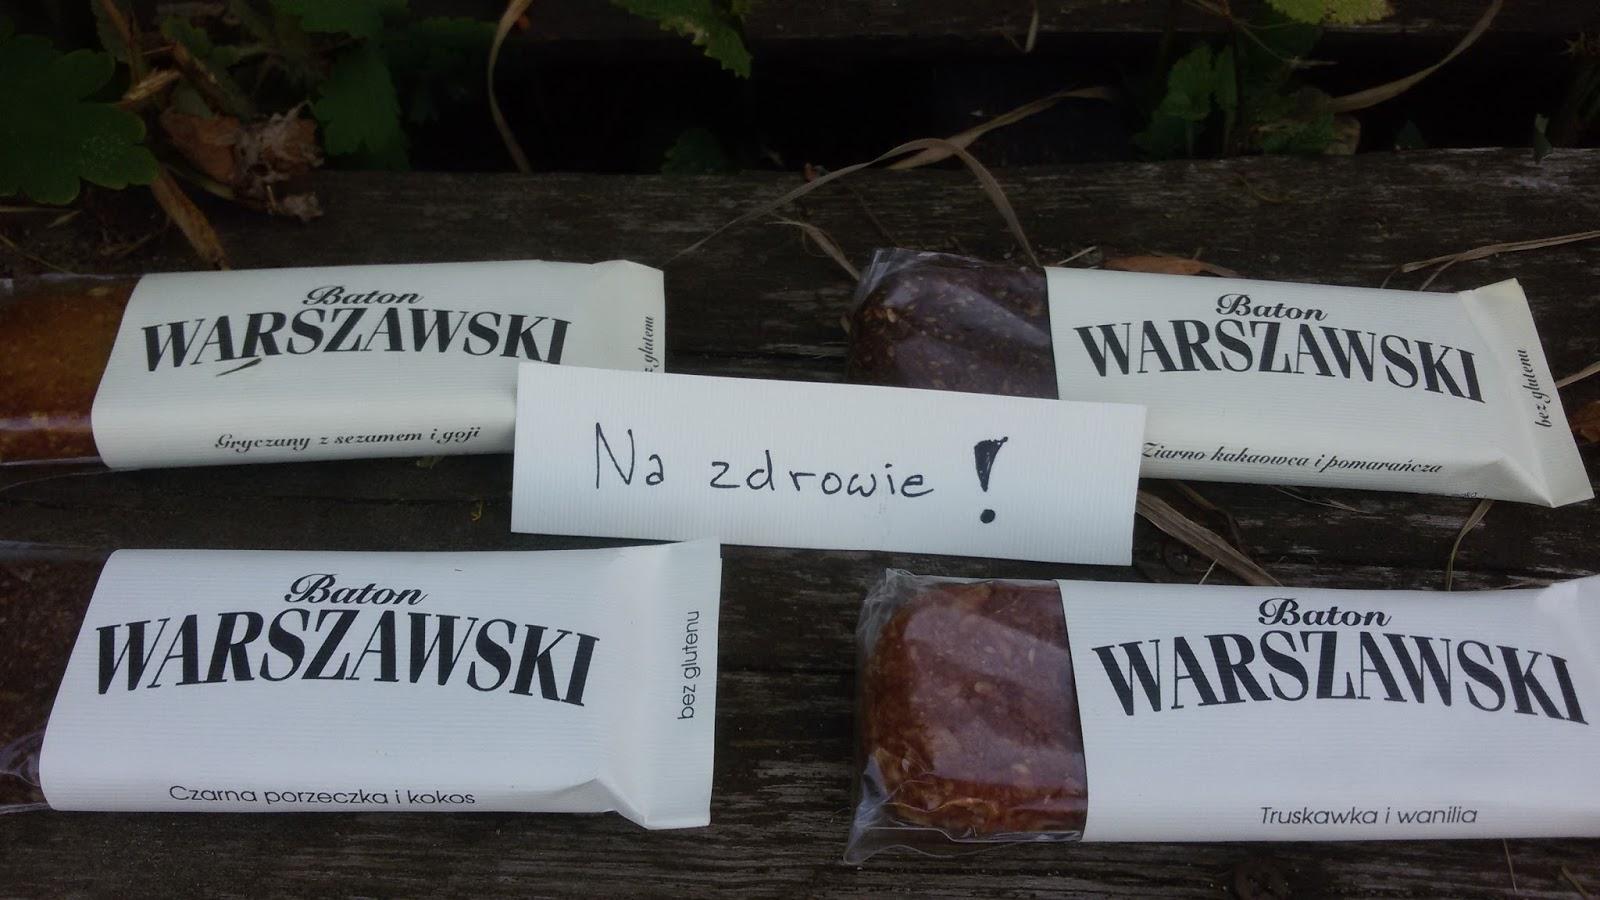 Naturalne batony | Baton Warszawski